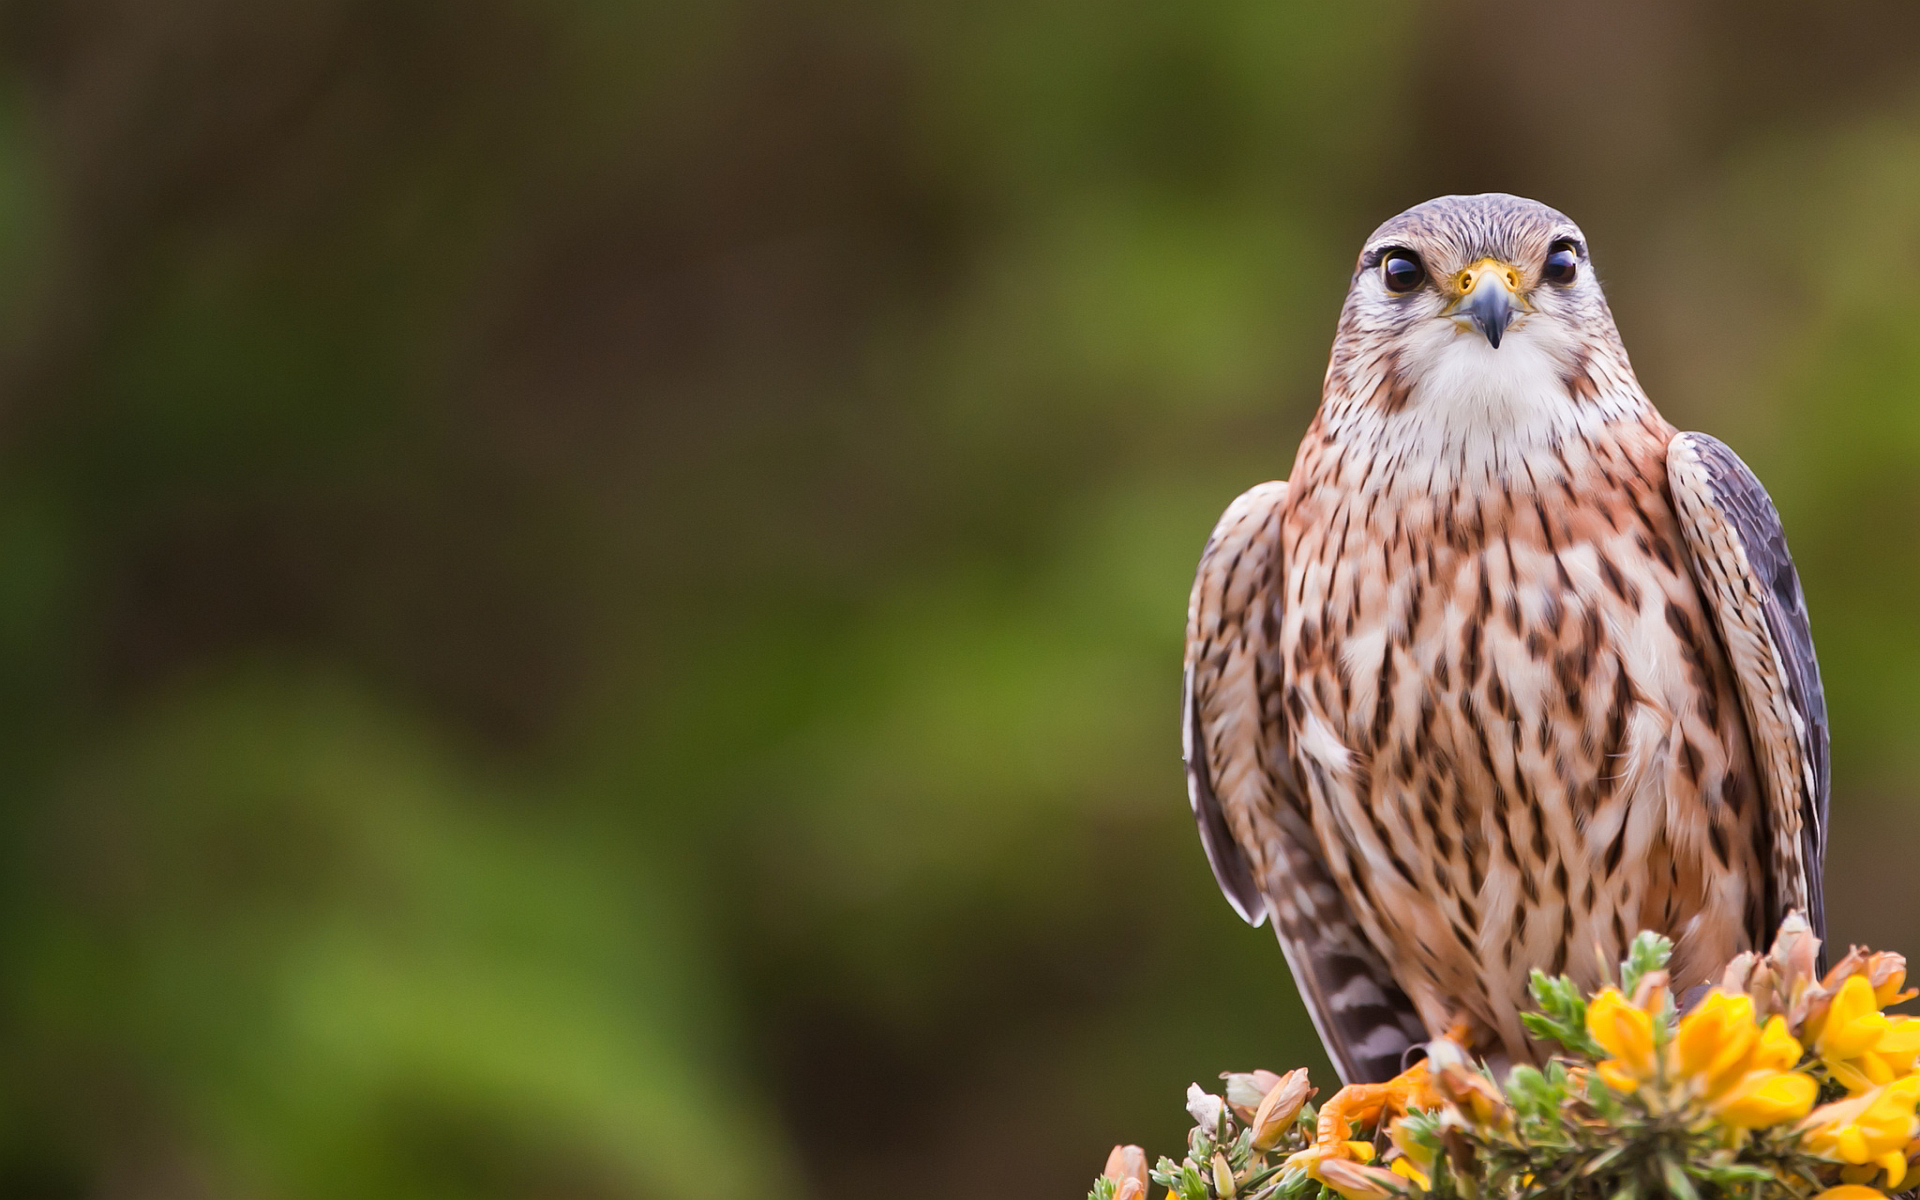 falcon wallpaper free